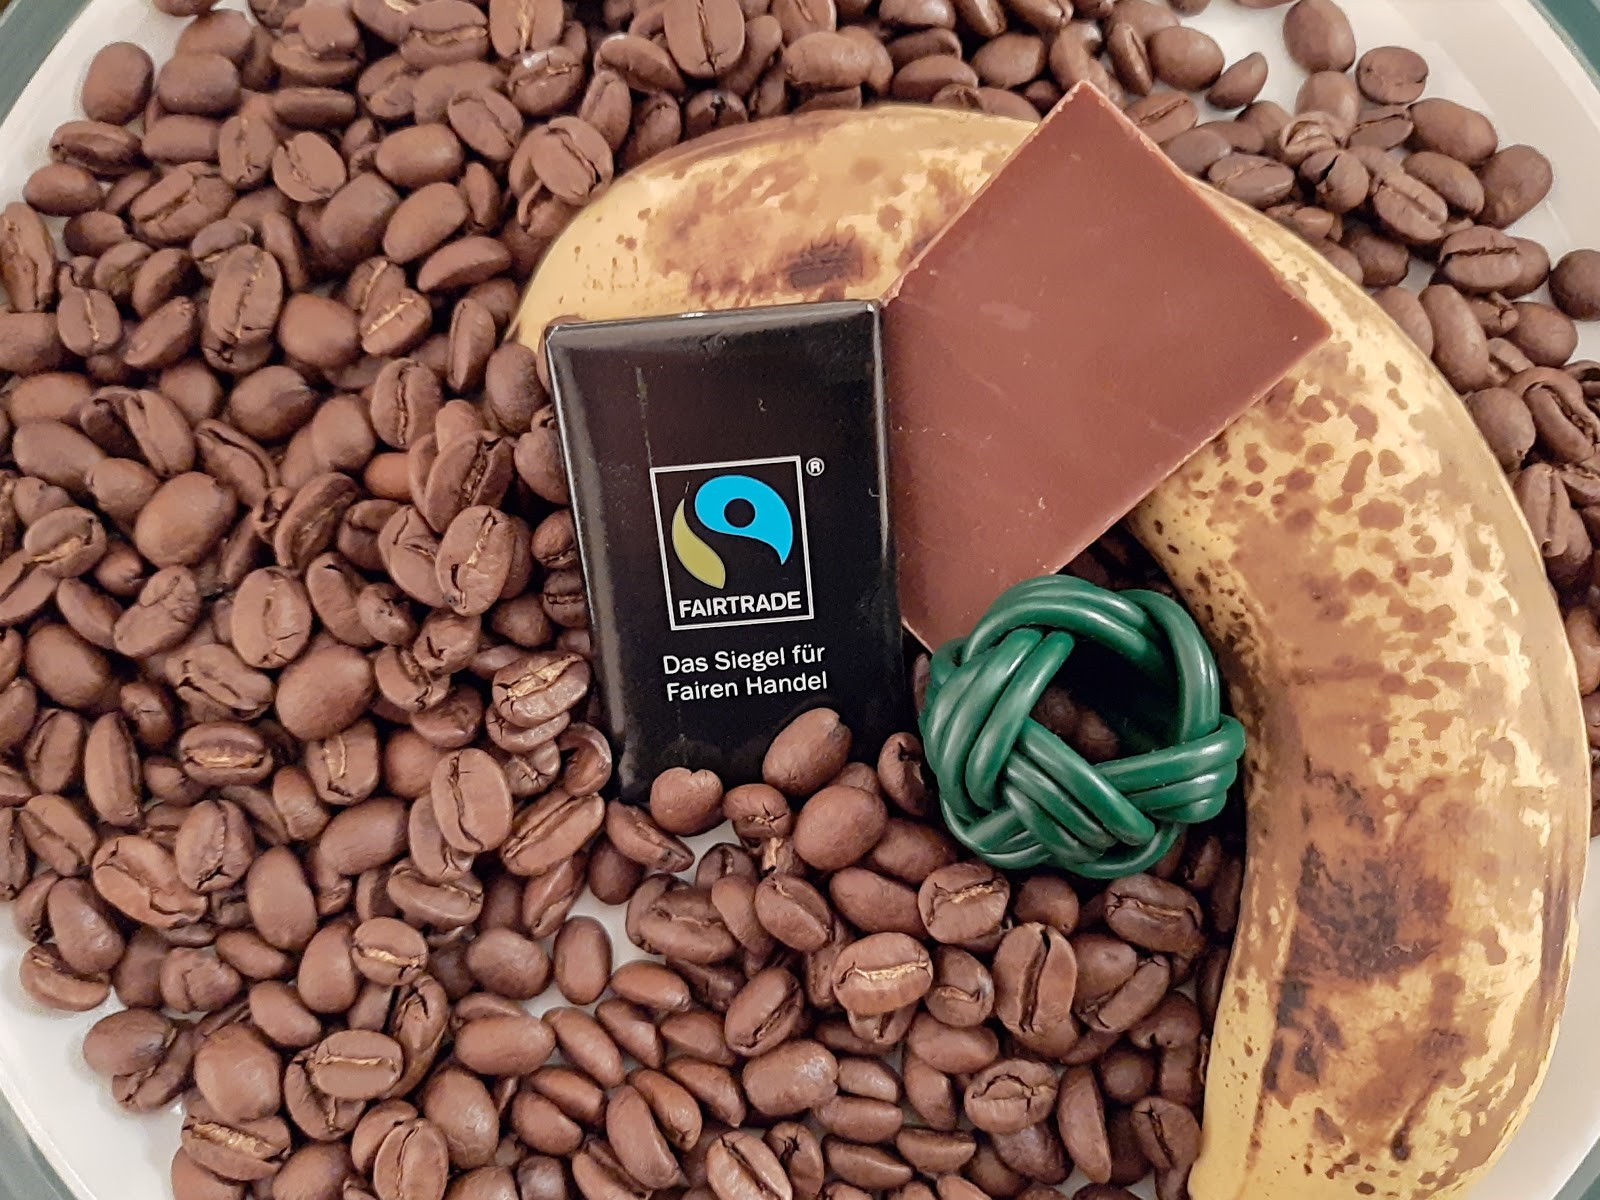 Fairtrade Scouts